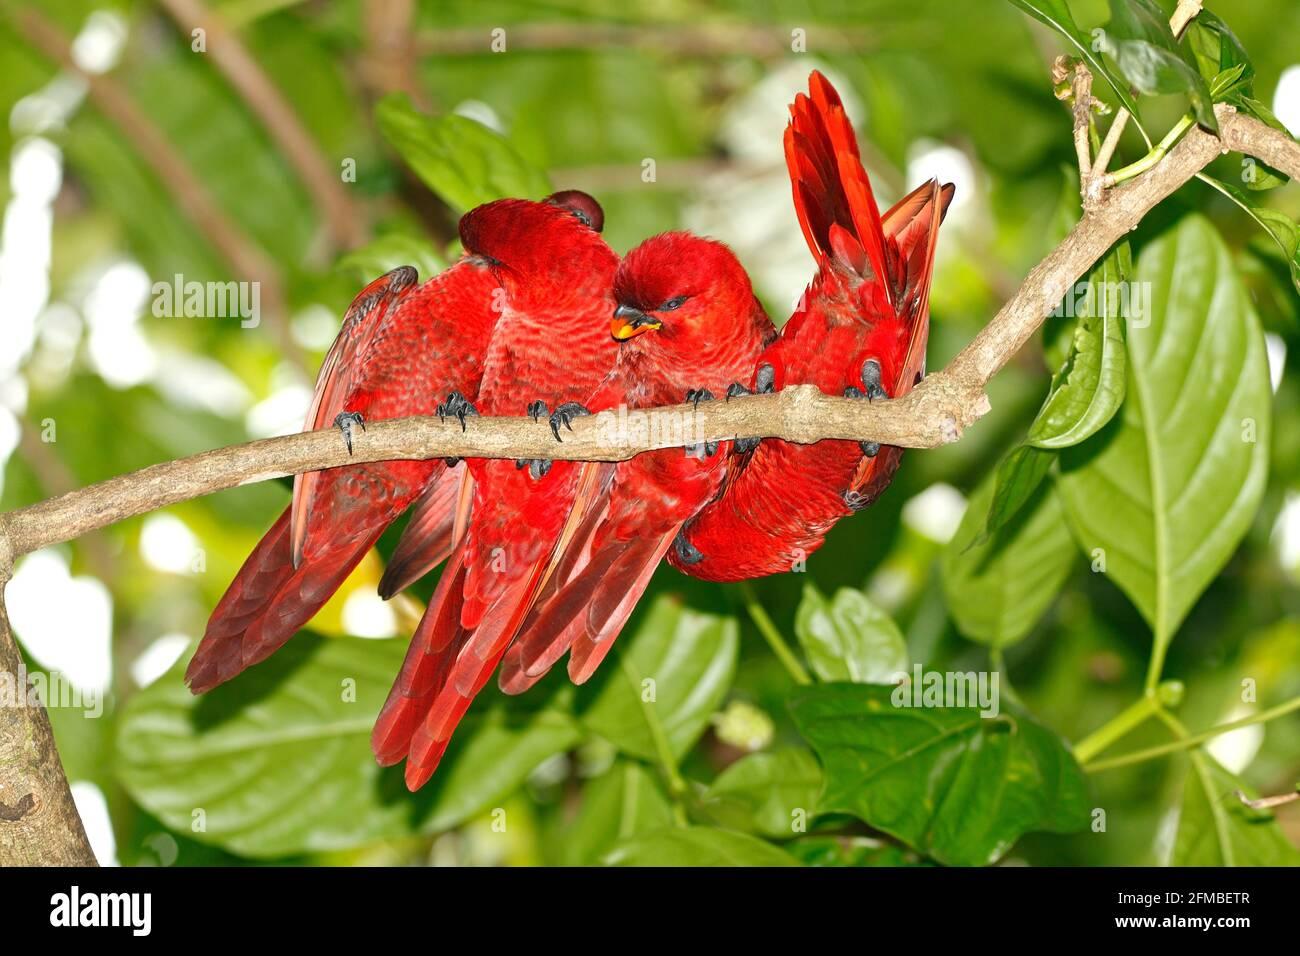 cardinal-lories-preening-each-other-pseudeos-cardinalis-chalcopsitta-cardinalis-four-wild-birds-photographed-at-uepi-solomon-islands-2FMBETR.jpg